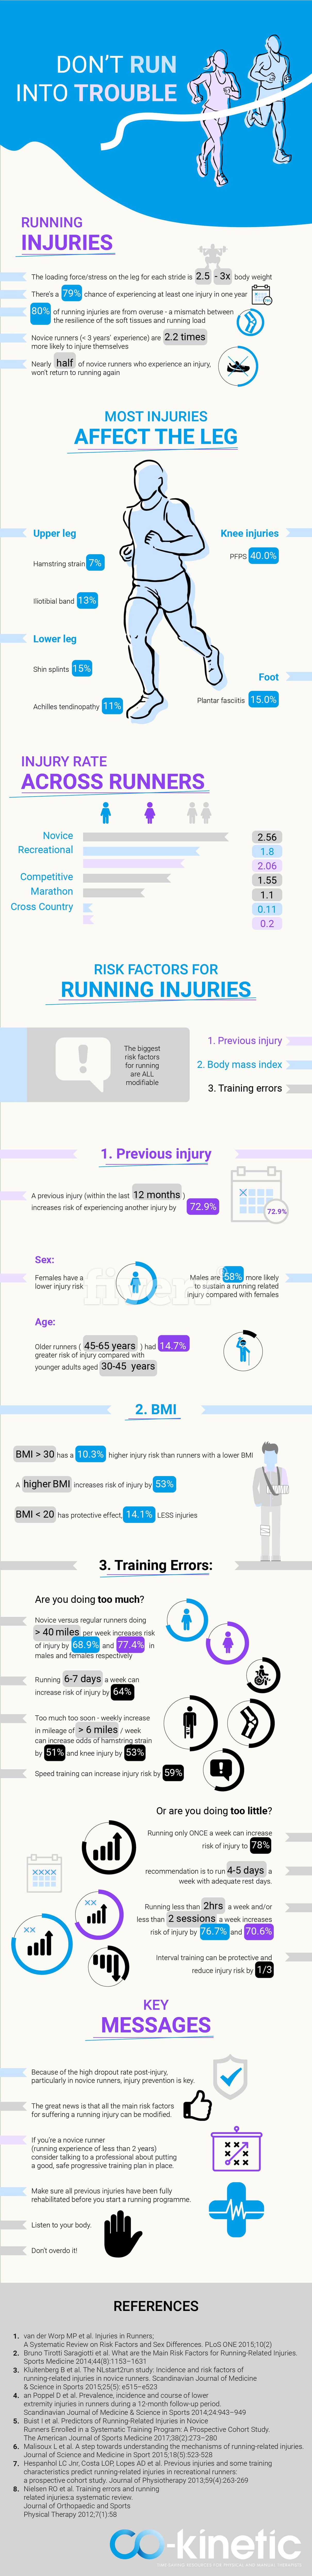 Running-Injuries-Infographic